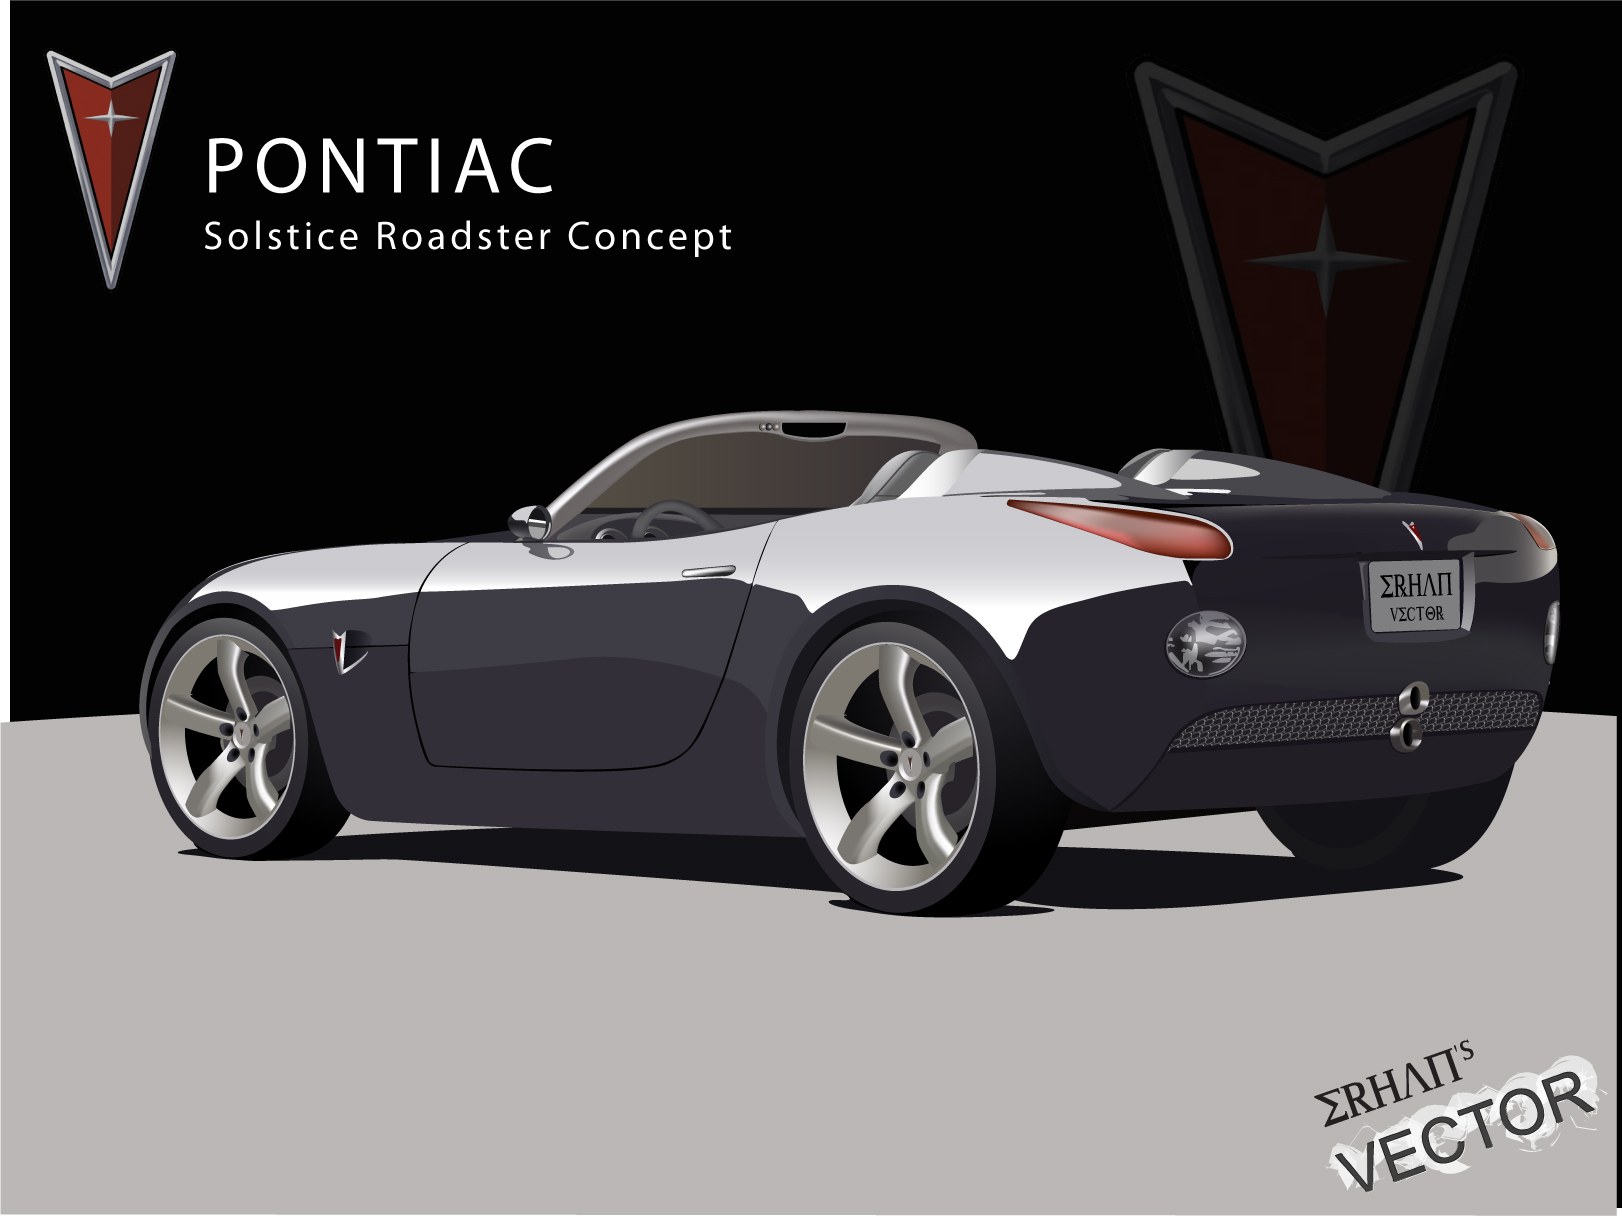 Pontiac Solstice Roadster Consept